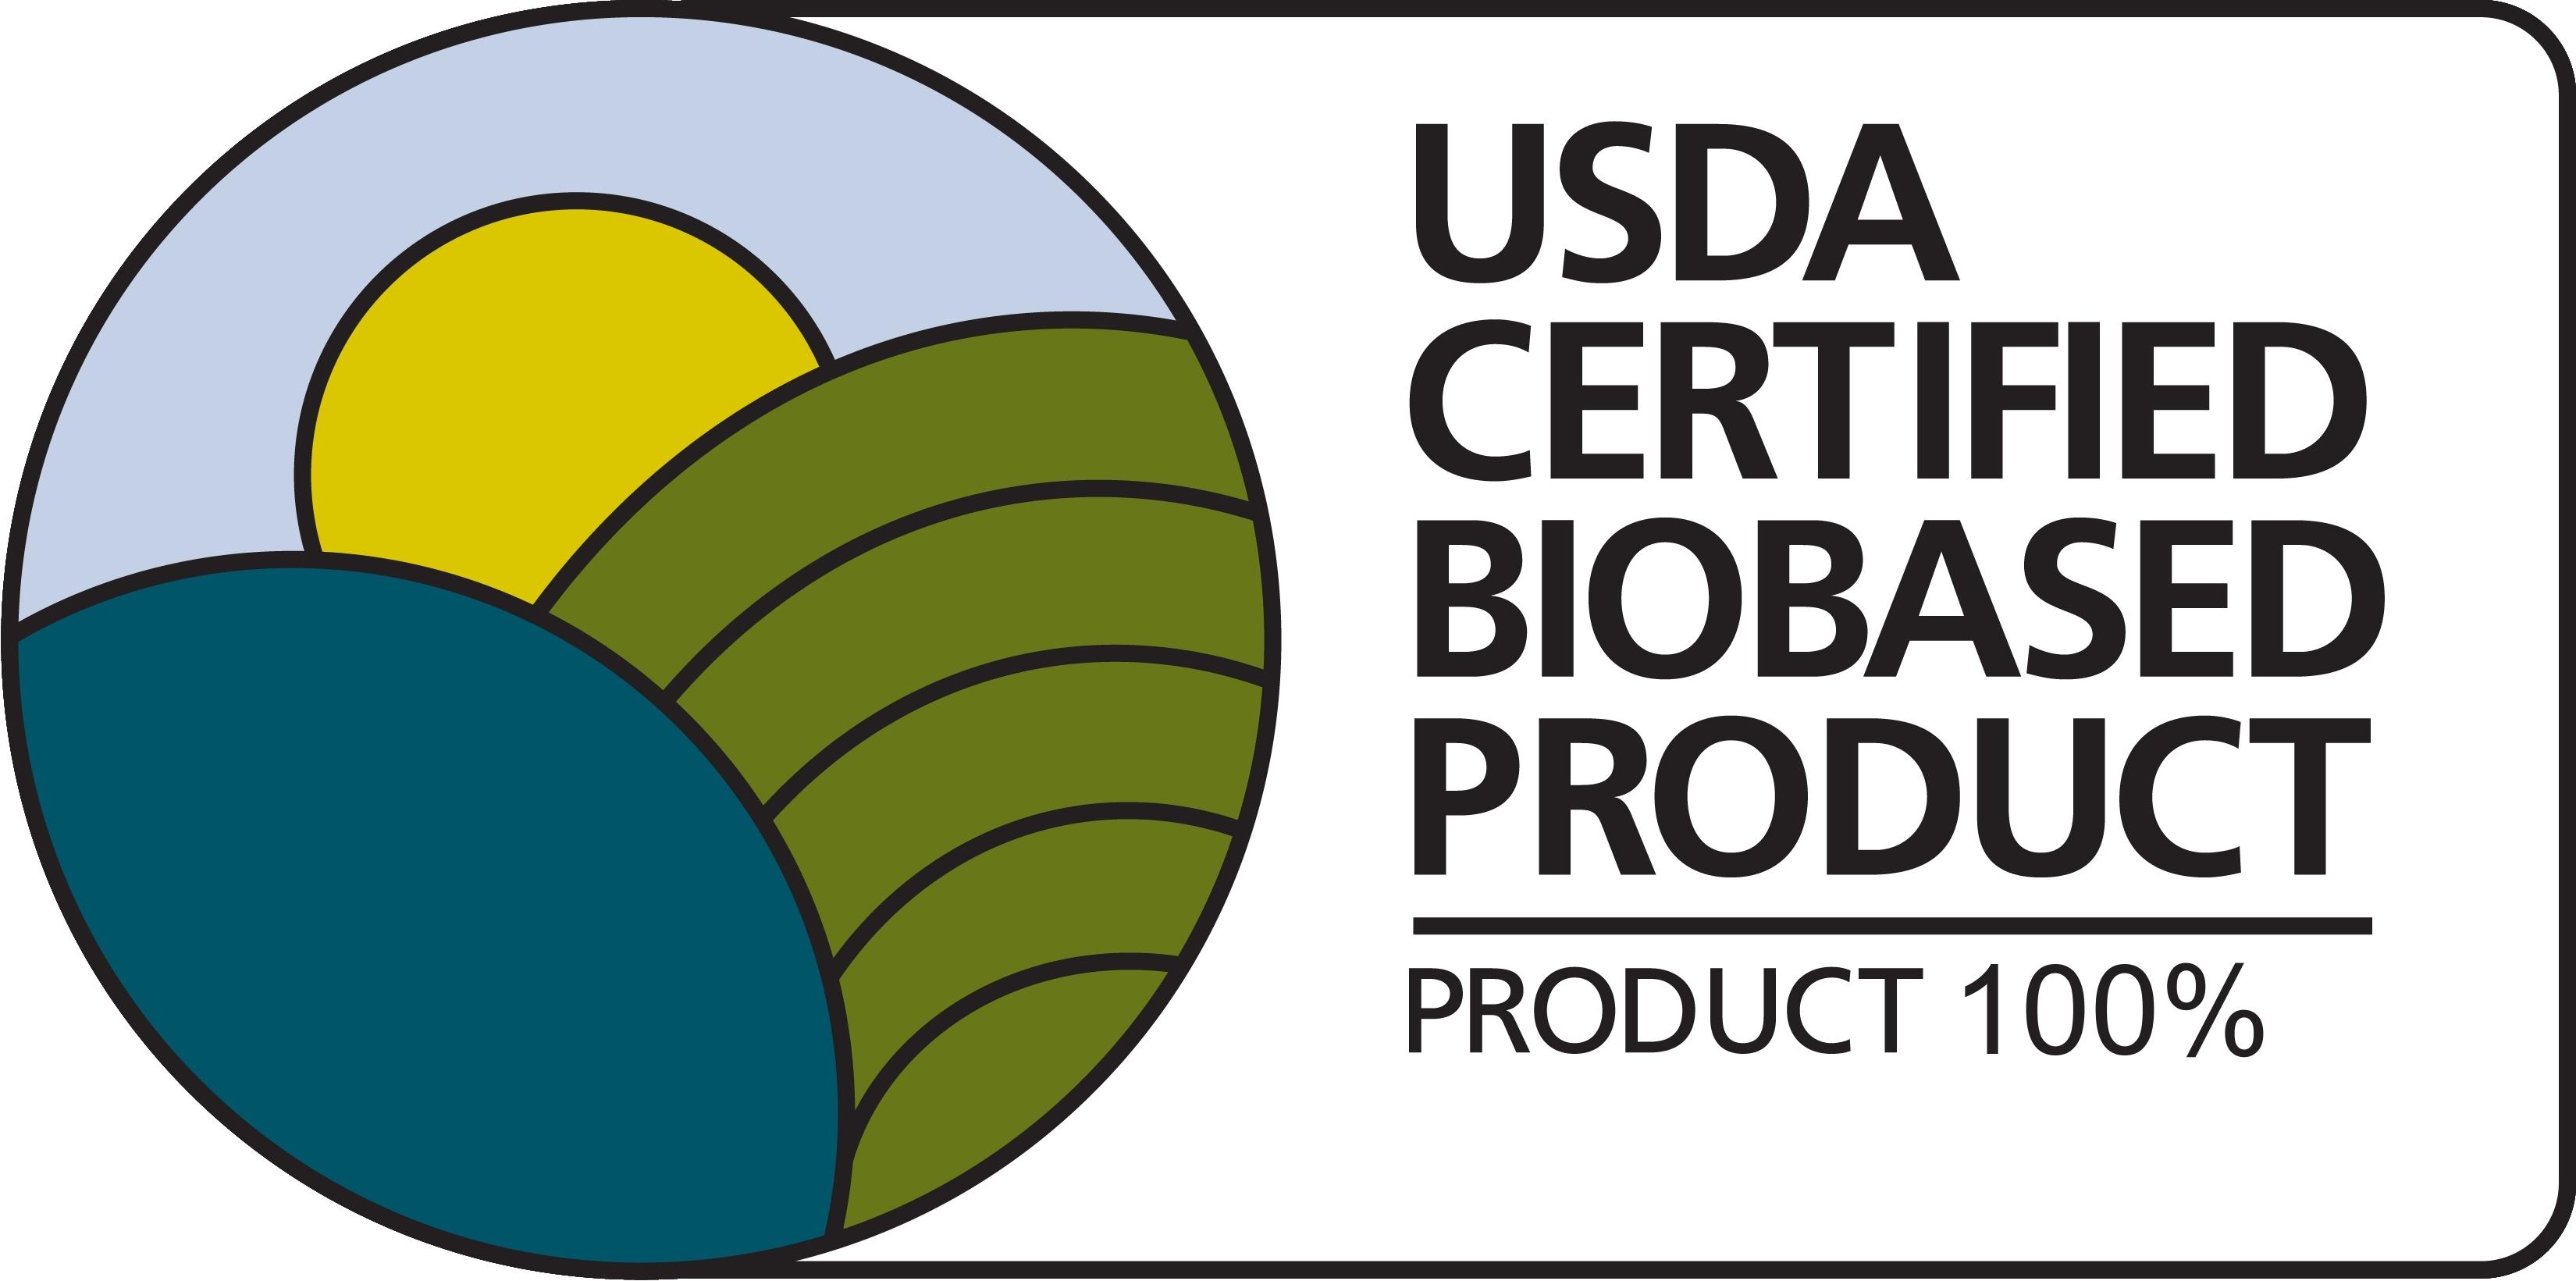 Bio clipart geneticist Biobased 100% USDA Surfactants Awarded